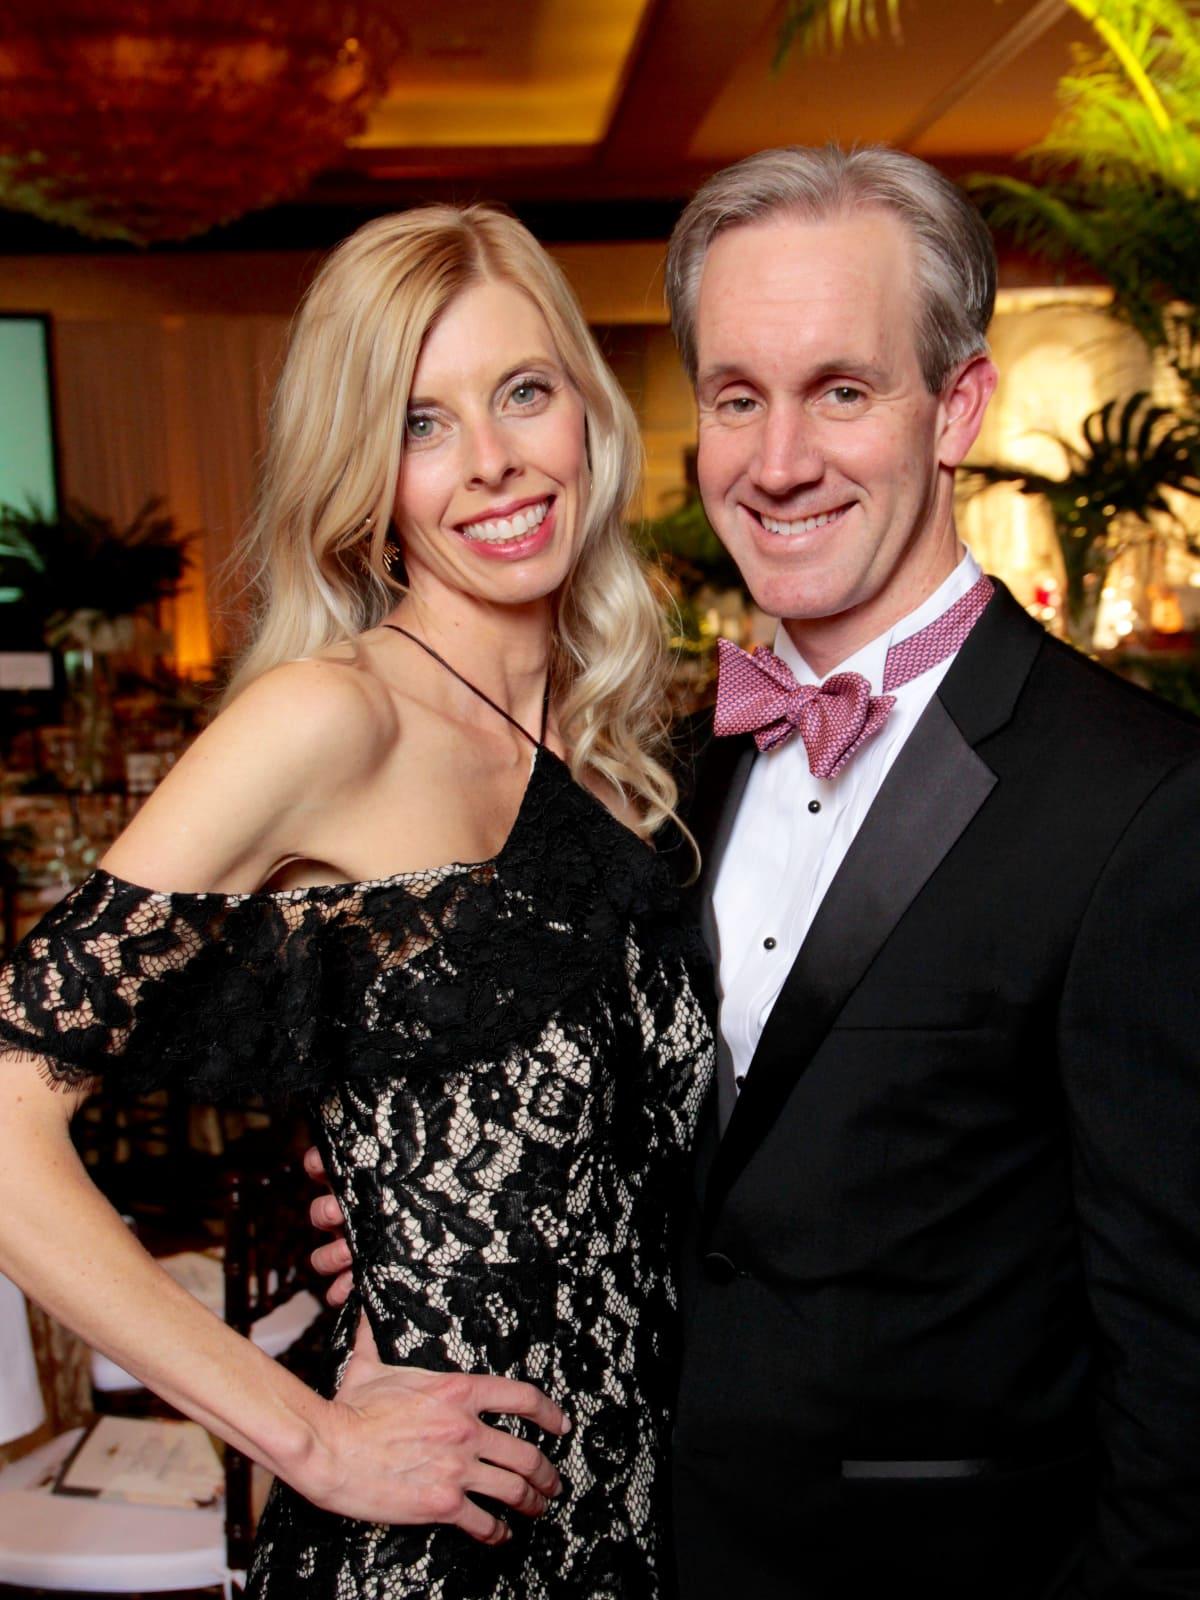 Houston, West University Park Lovers' Ball, February 2018, Jennifer Blum, Daniel Blum